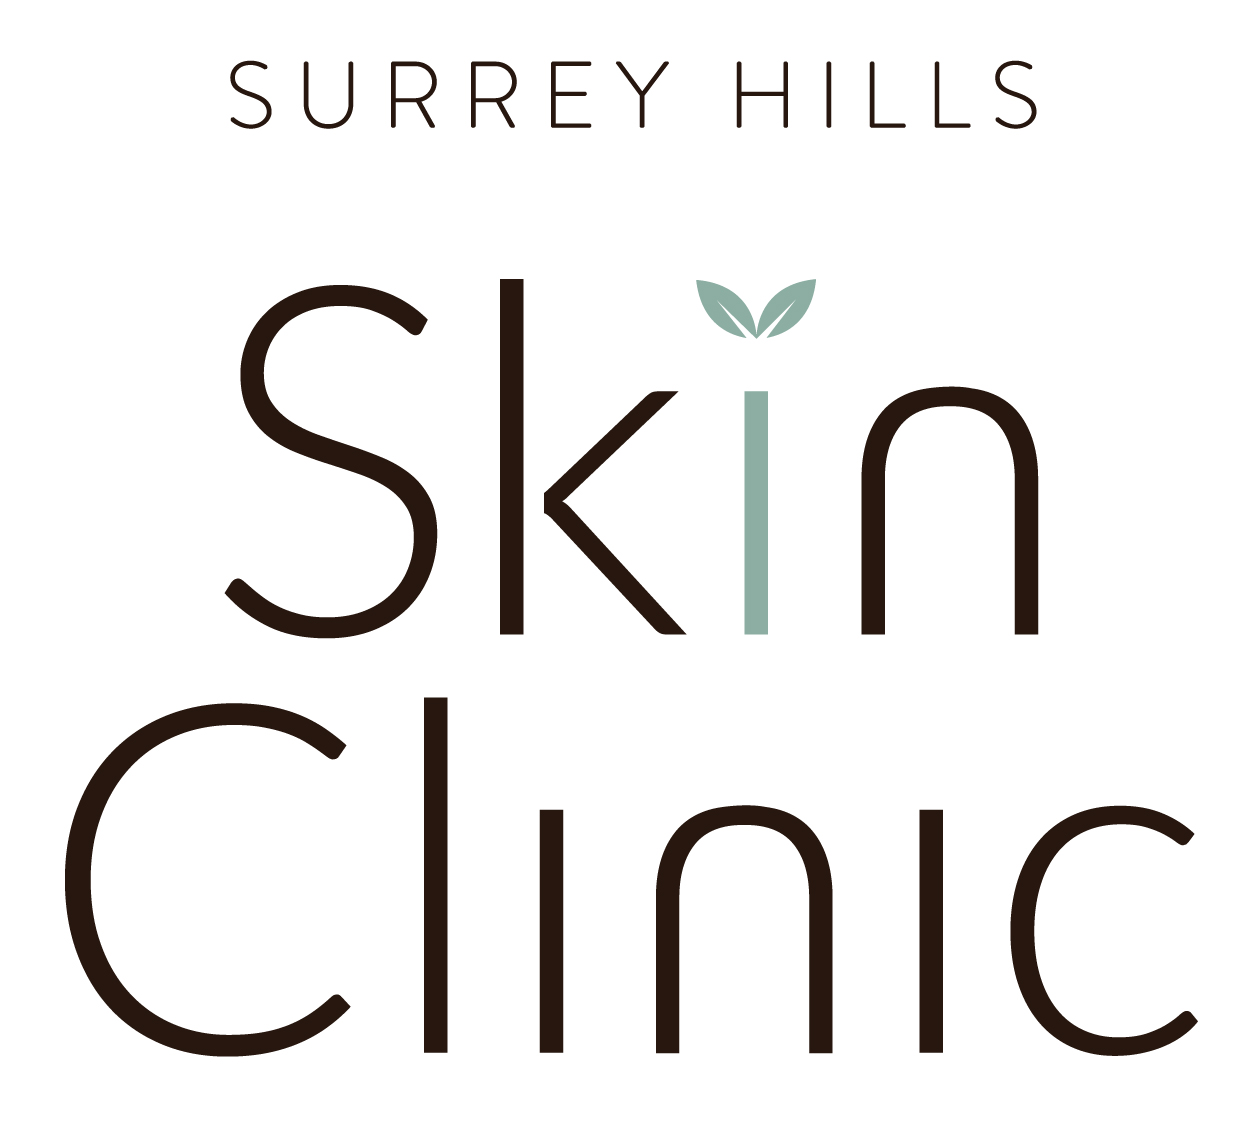 Surrey Hills Skin Clinic, Ashtead